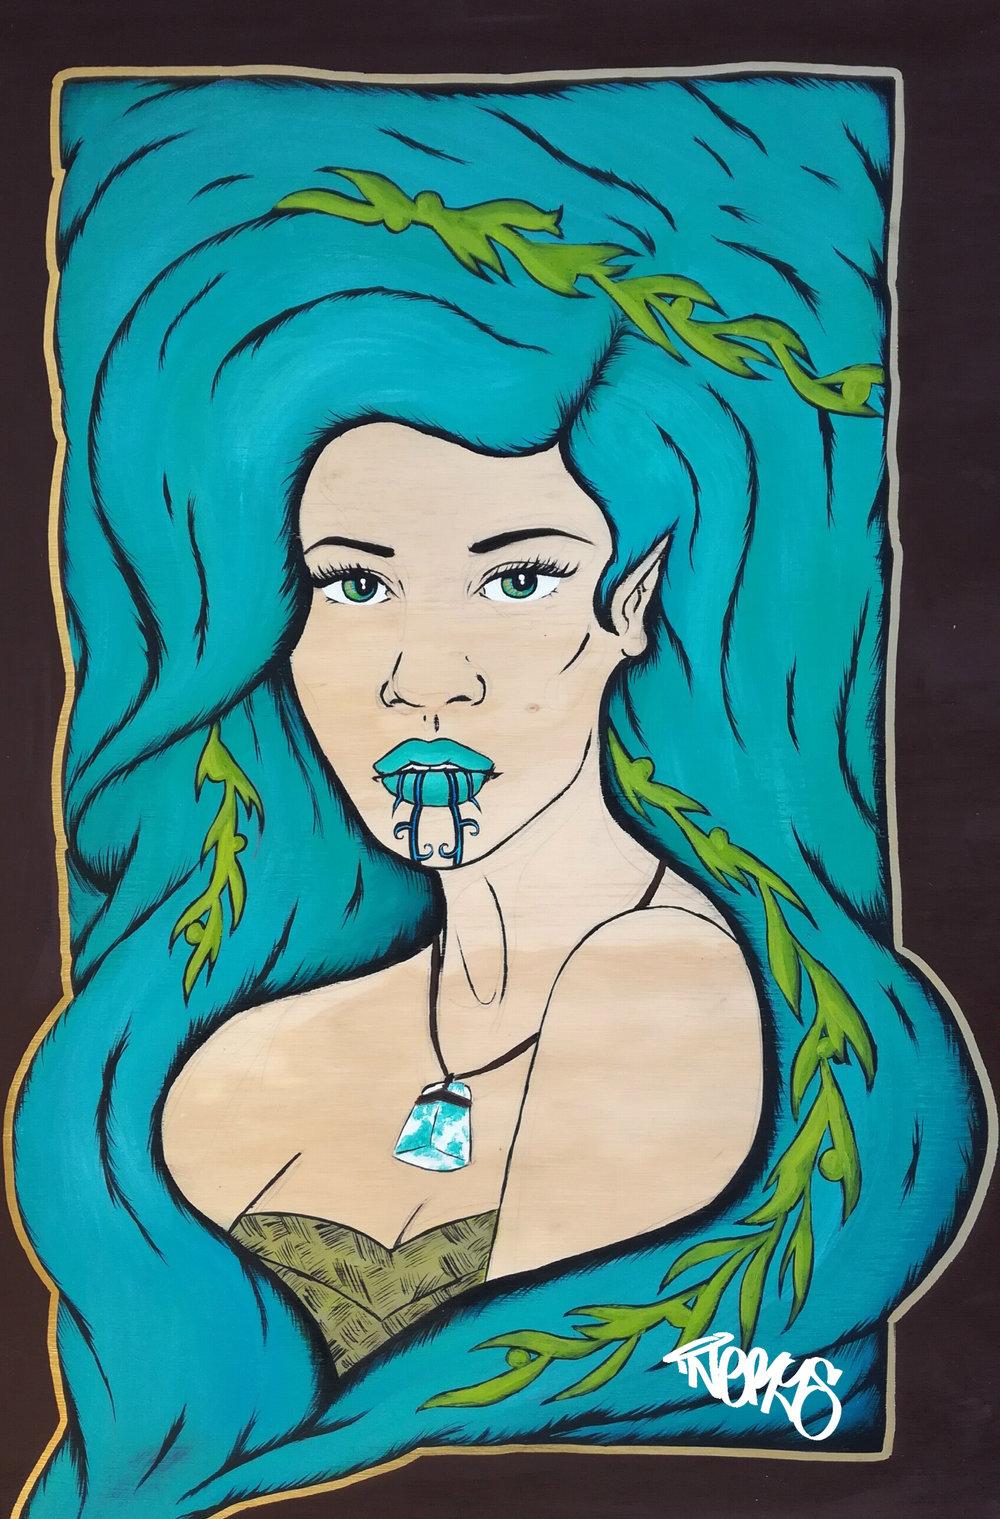 'Marakihau' by Nerys Baker.